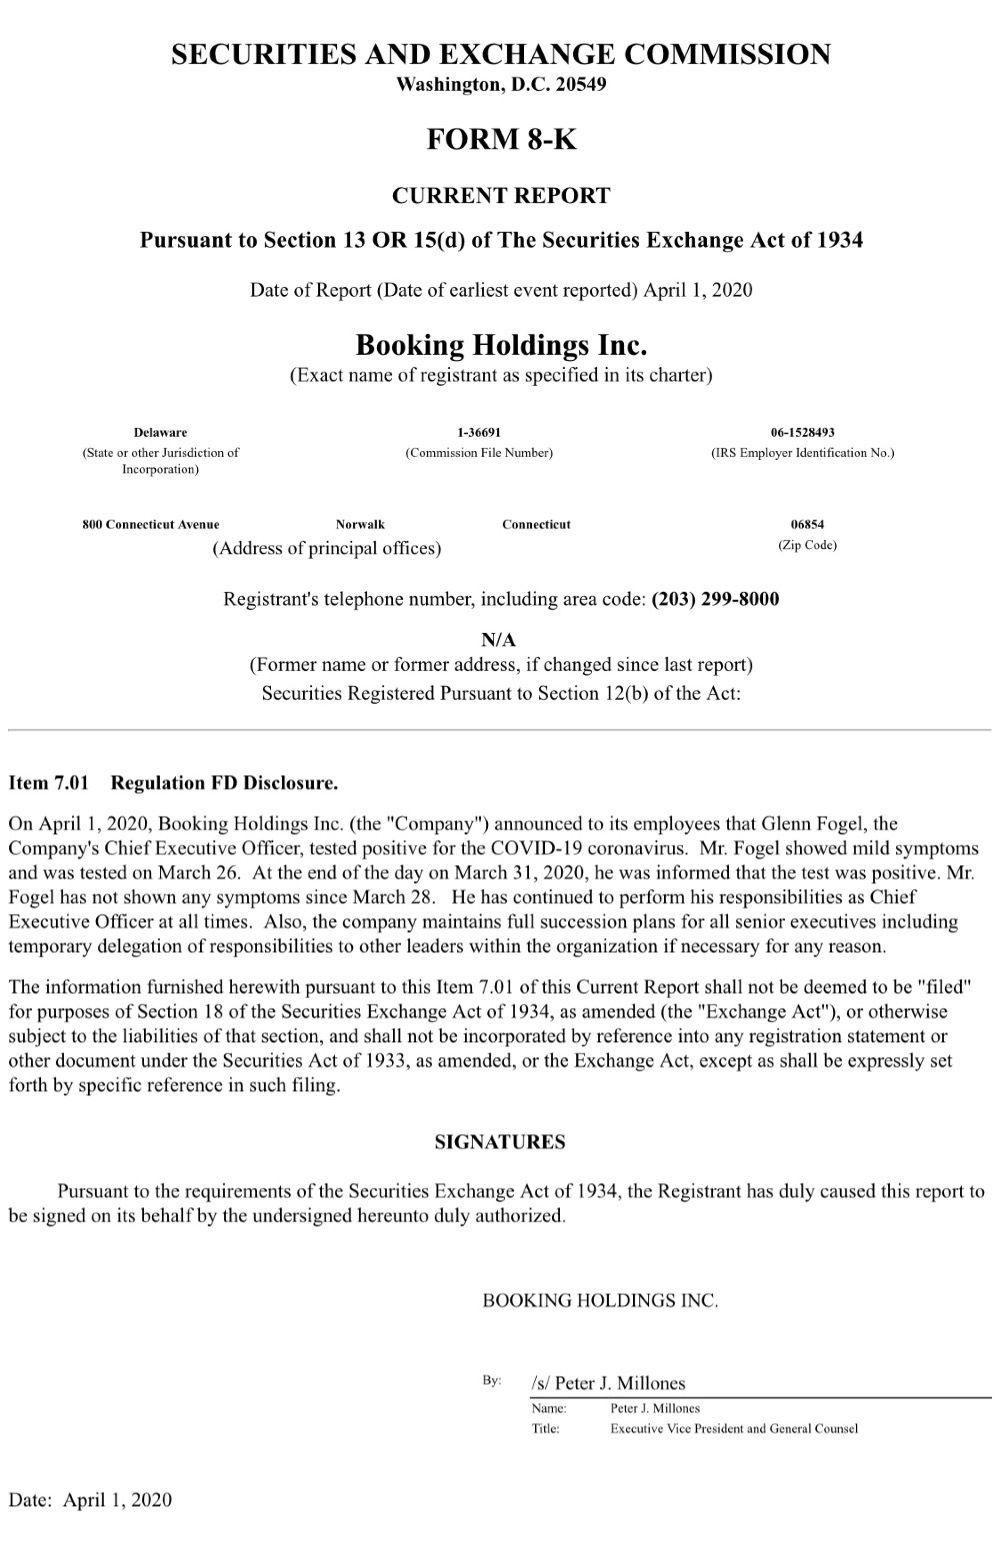 Booking CEO新冠病毒检测呈阳性